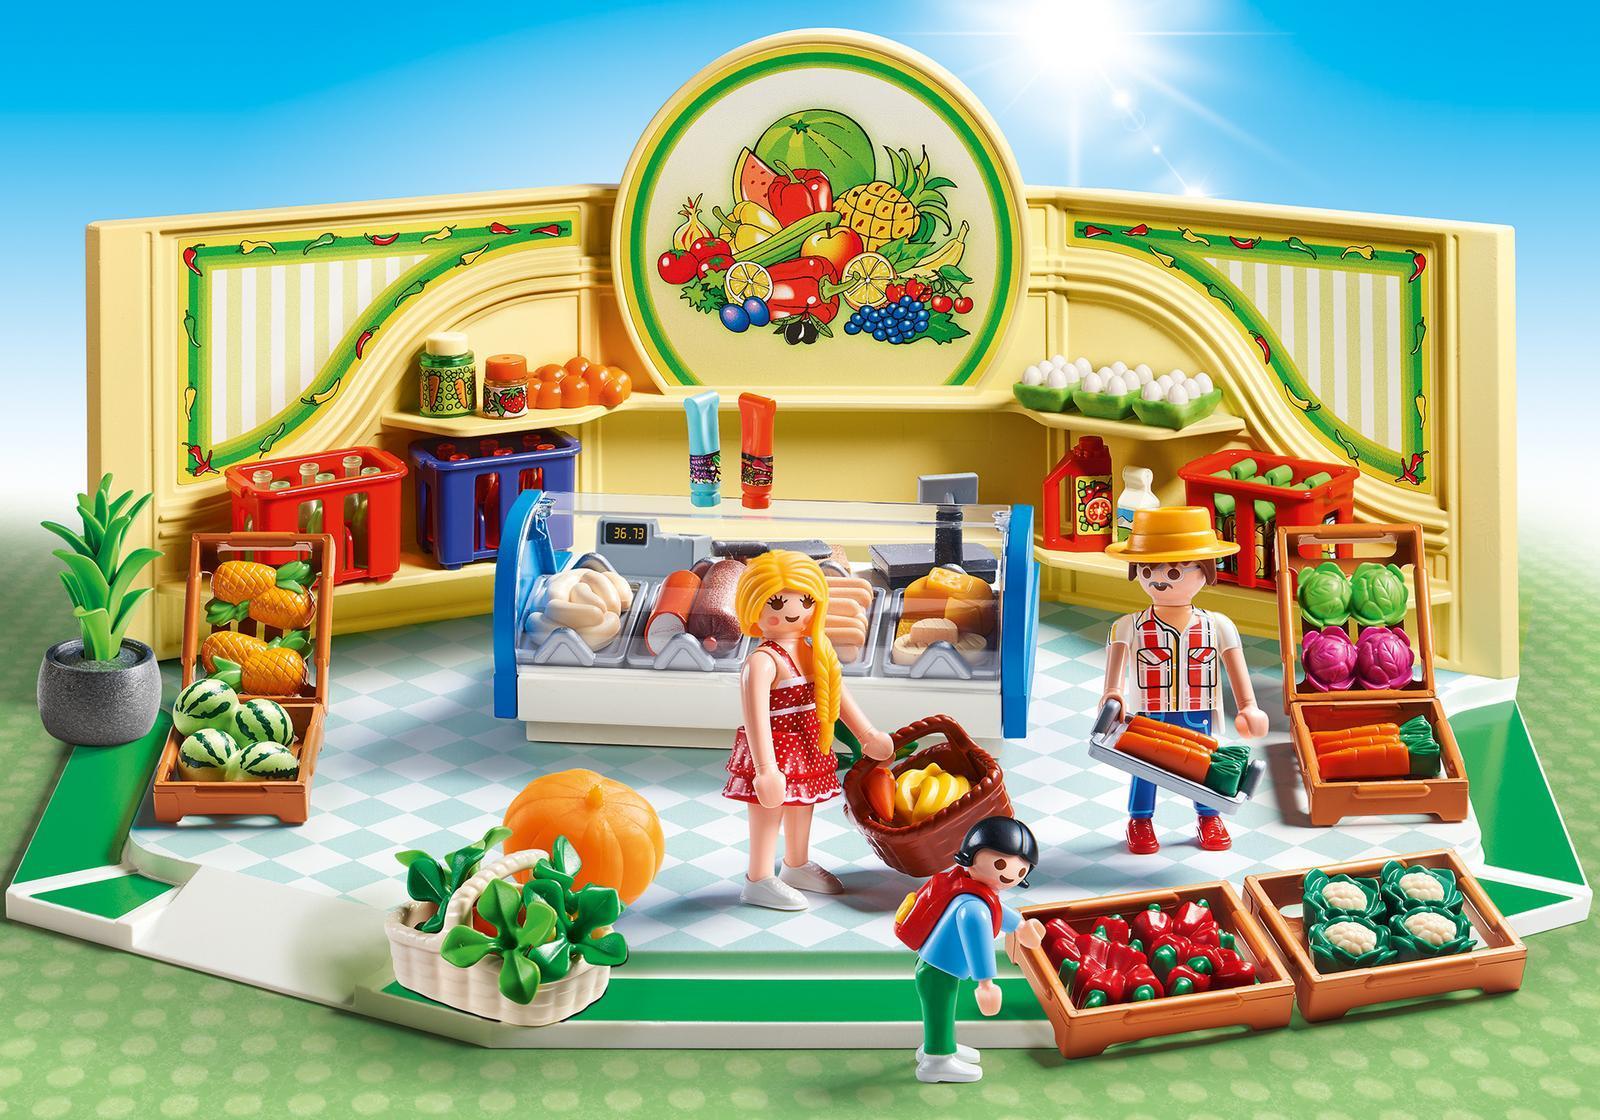 Playmobil City Life Bioladen - Aktion/Abenteuer...